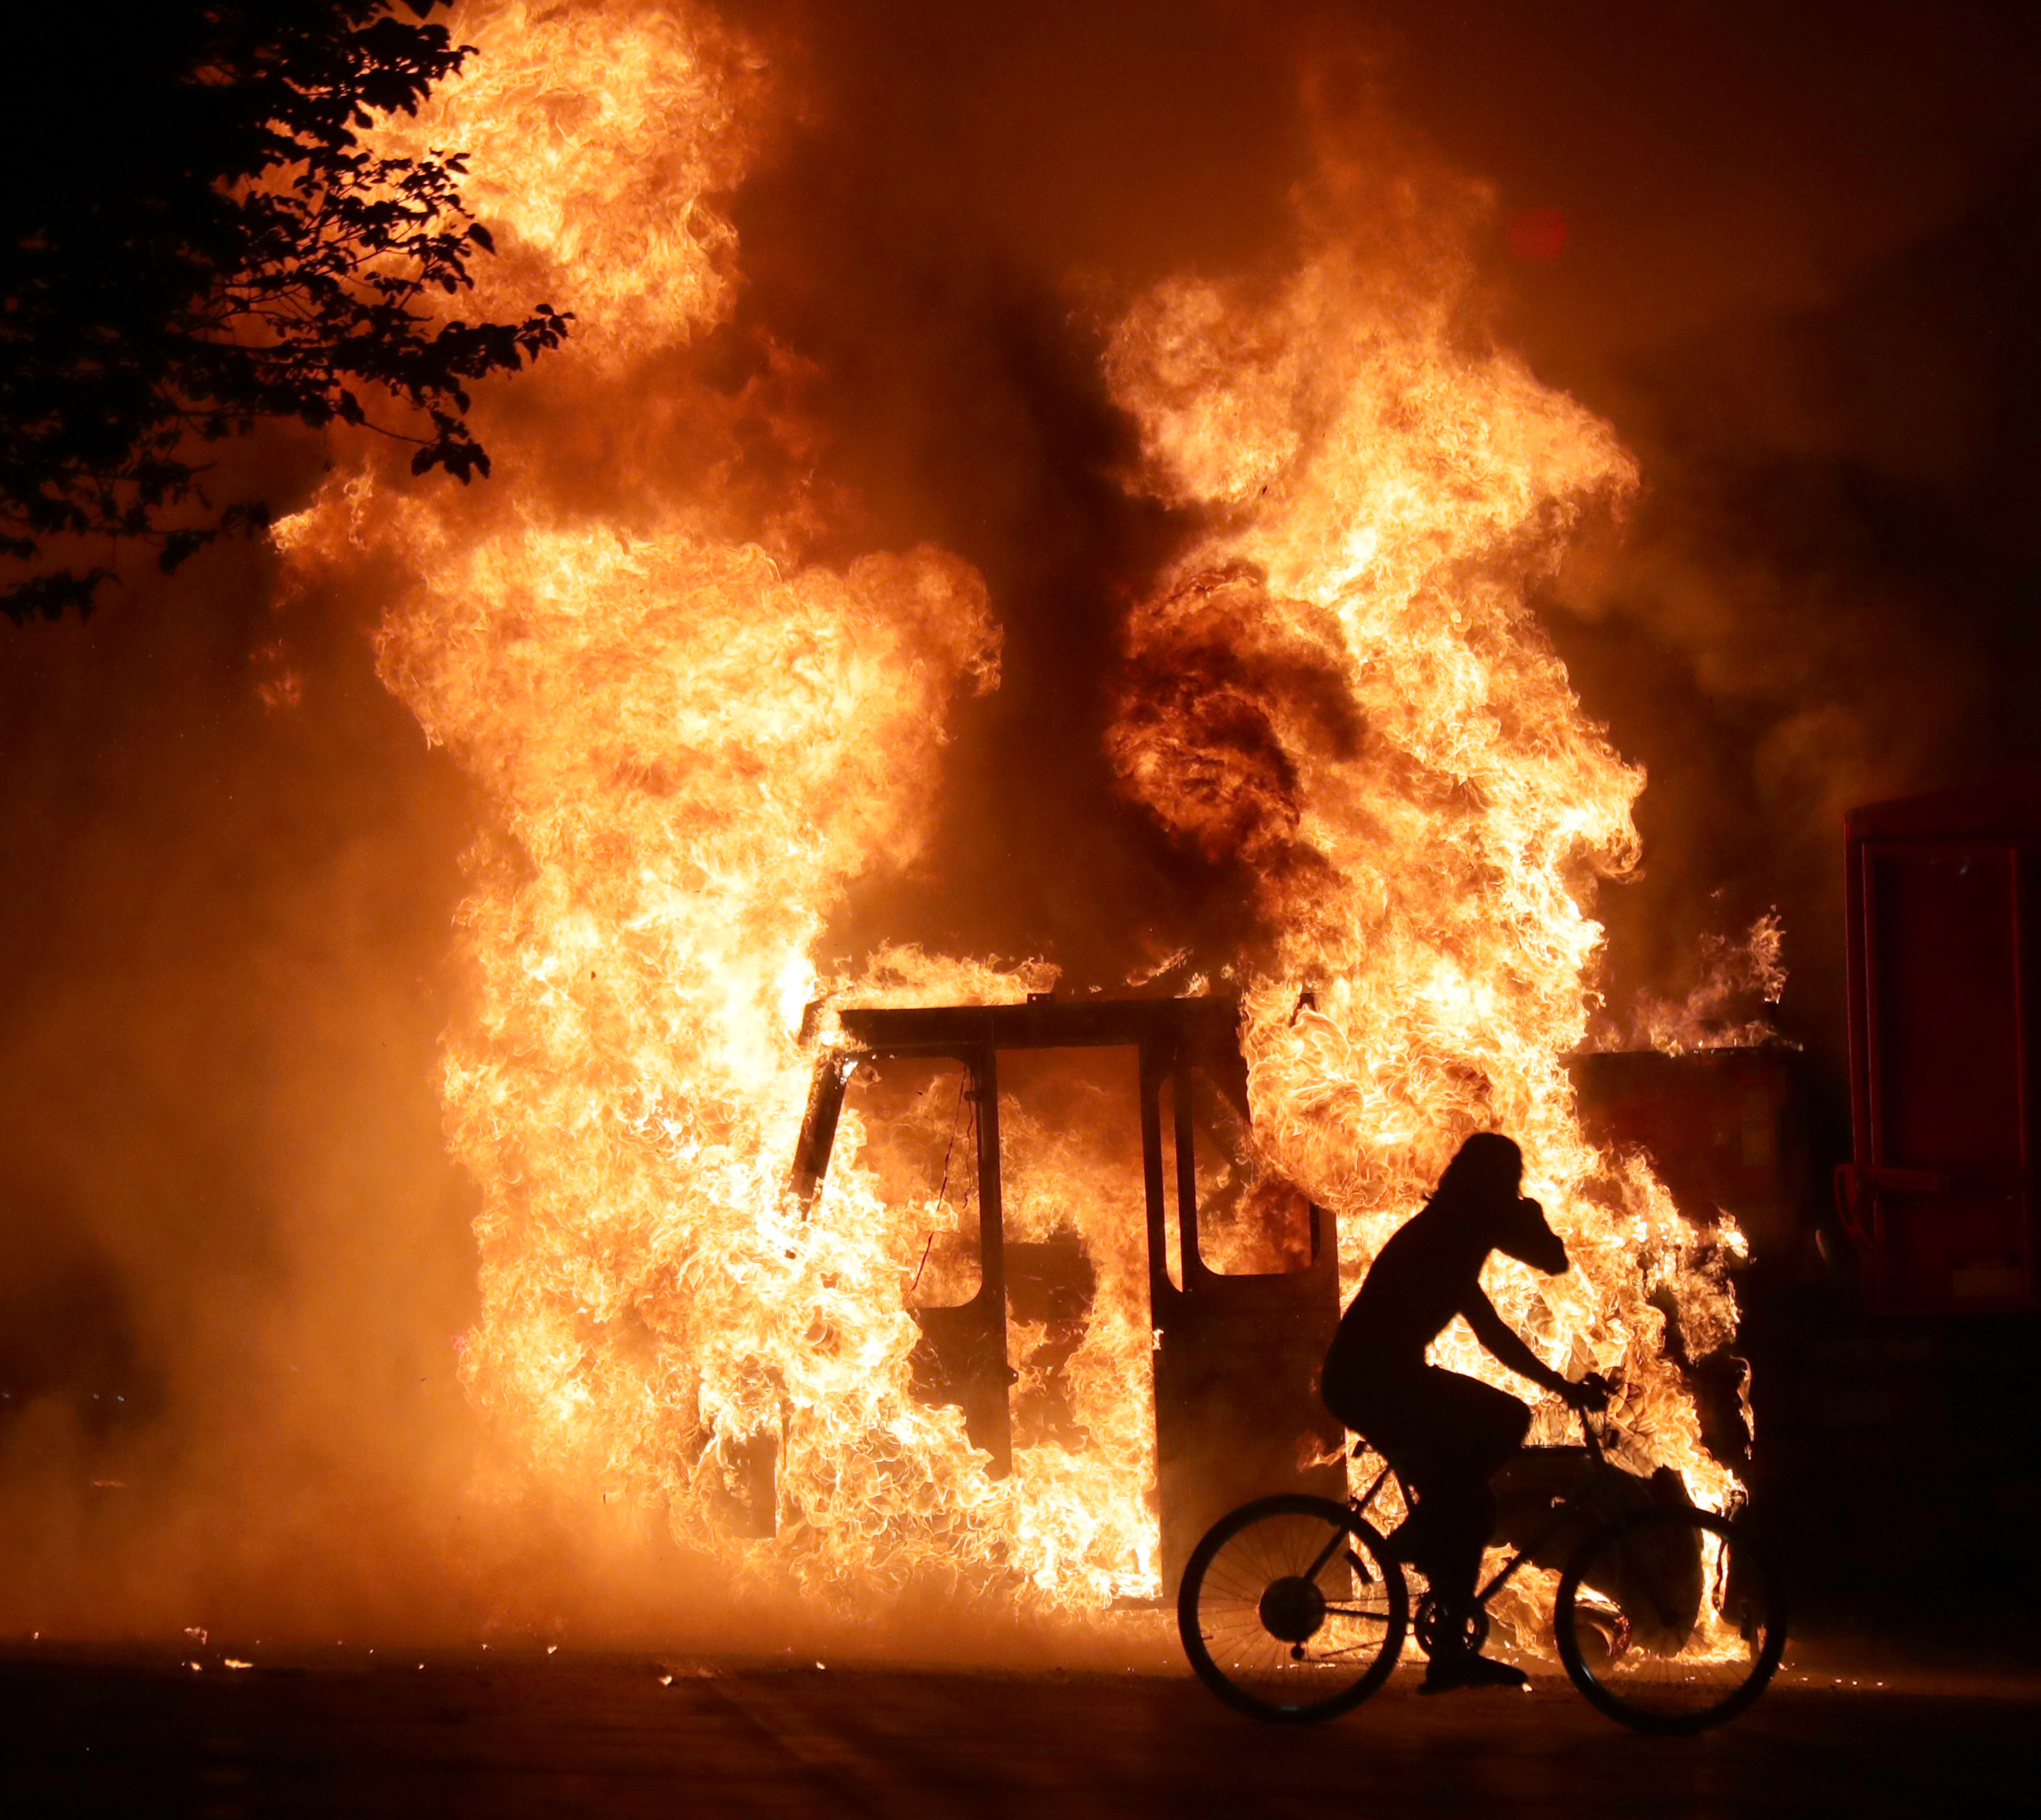 Un camión incendiado por los manifestantes (Mike De Sisti/Milwaukee Journal Sentinel via USA TODAY via REUTERS)